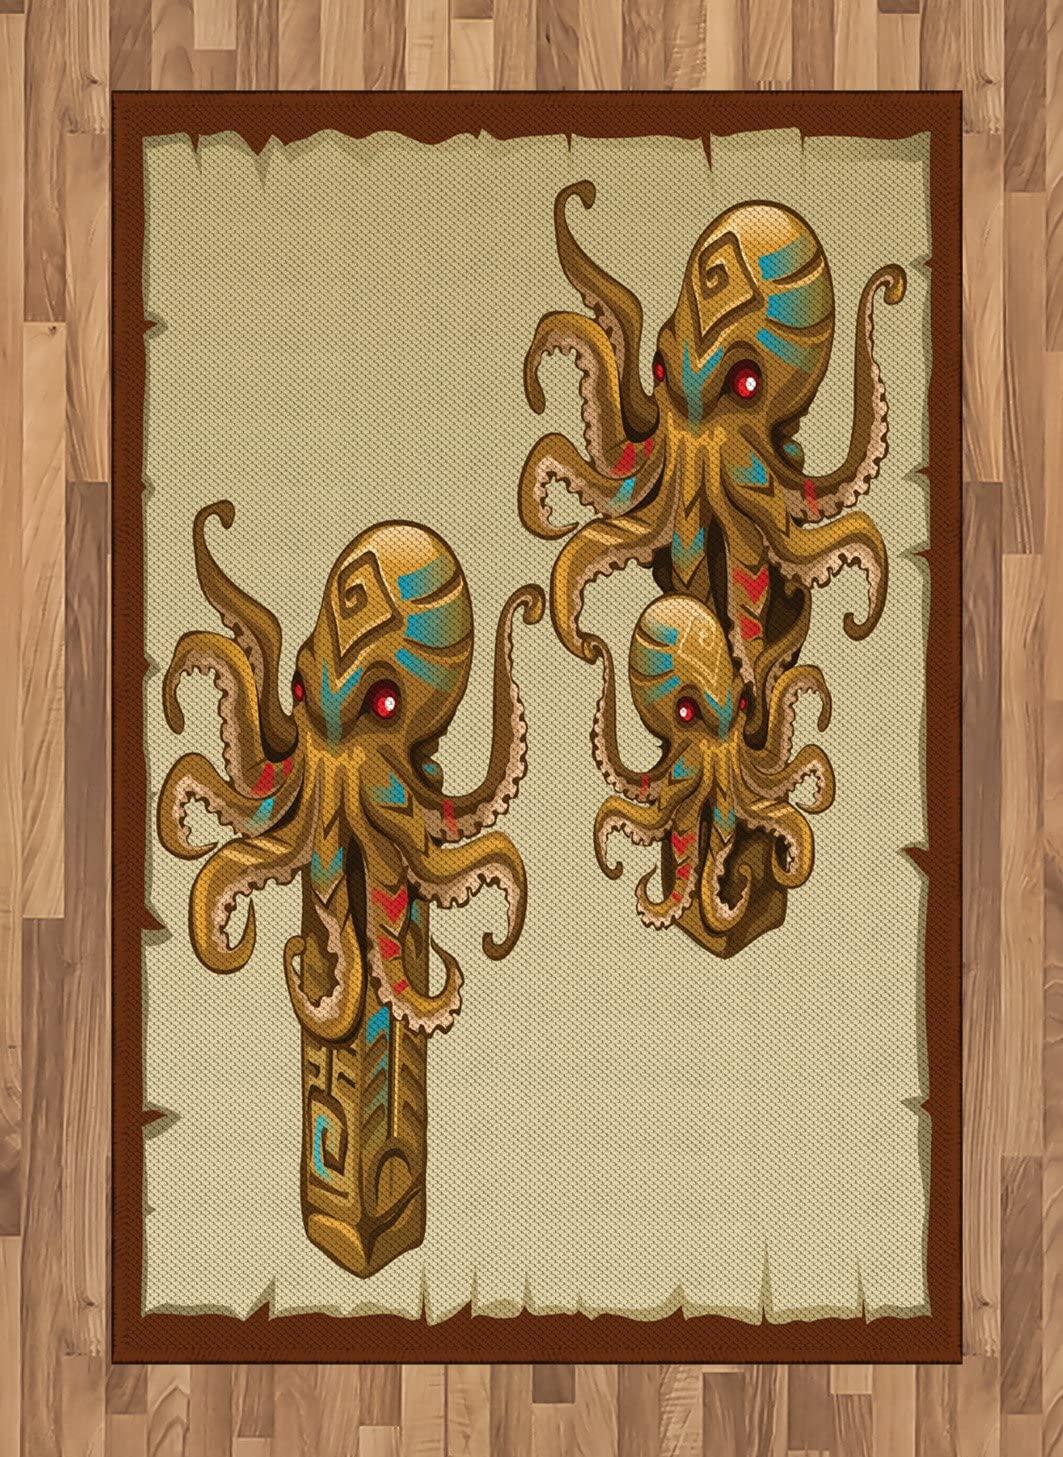 Ambesonne Octopus Area Rug, Cartoon Art Tribal Monster Kraken Sculpture Ornament Illustrations Sea Creature Print, Flat Woven Accent Rug for Living Room Bedroom Dining Room, 4 X 5.7 FT, Brown